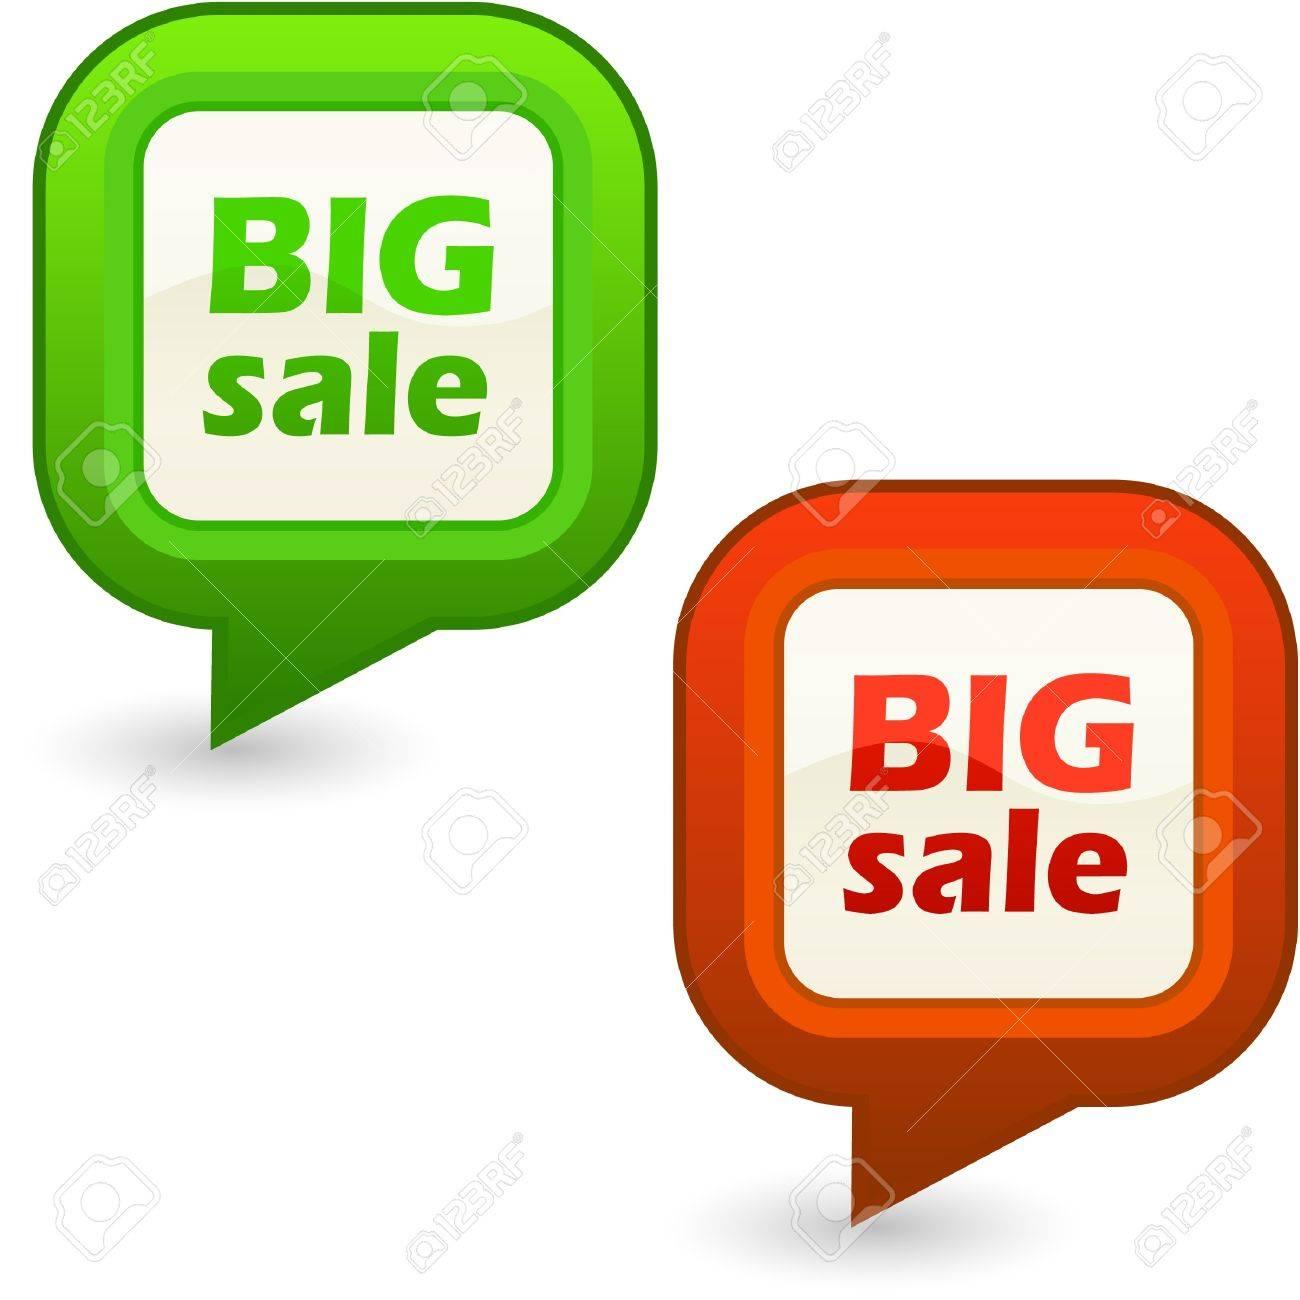 BIG SALE. Design element set for sale. Stock Vector - 8954100